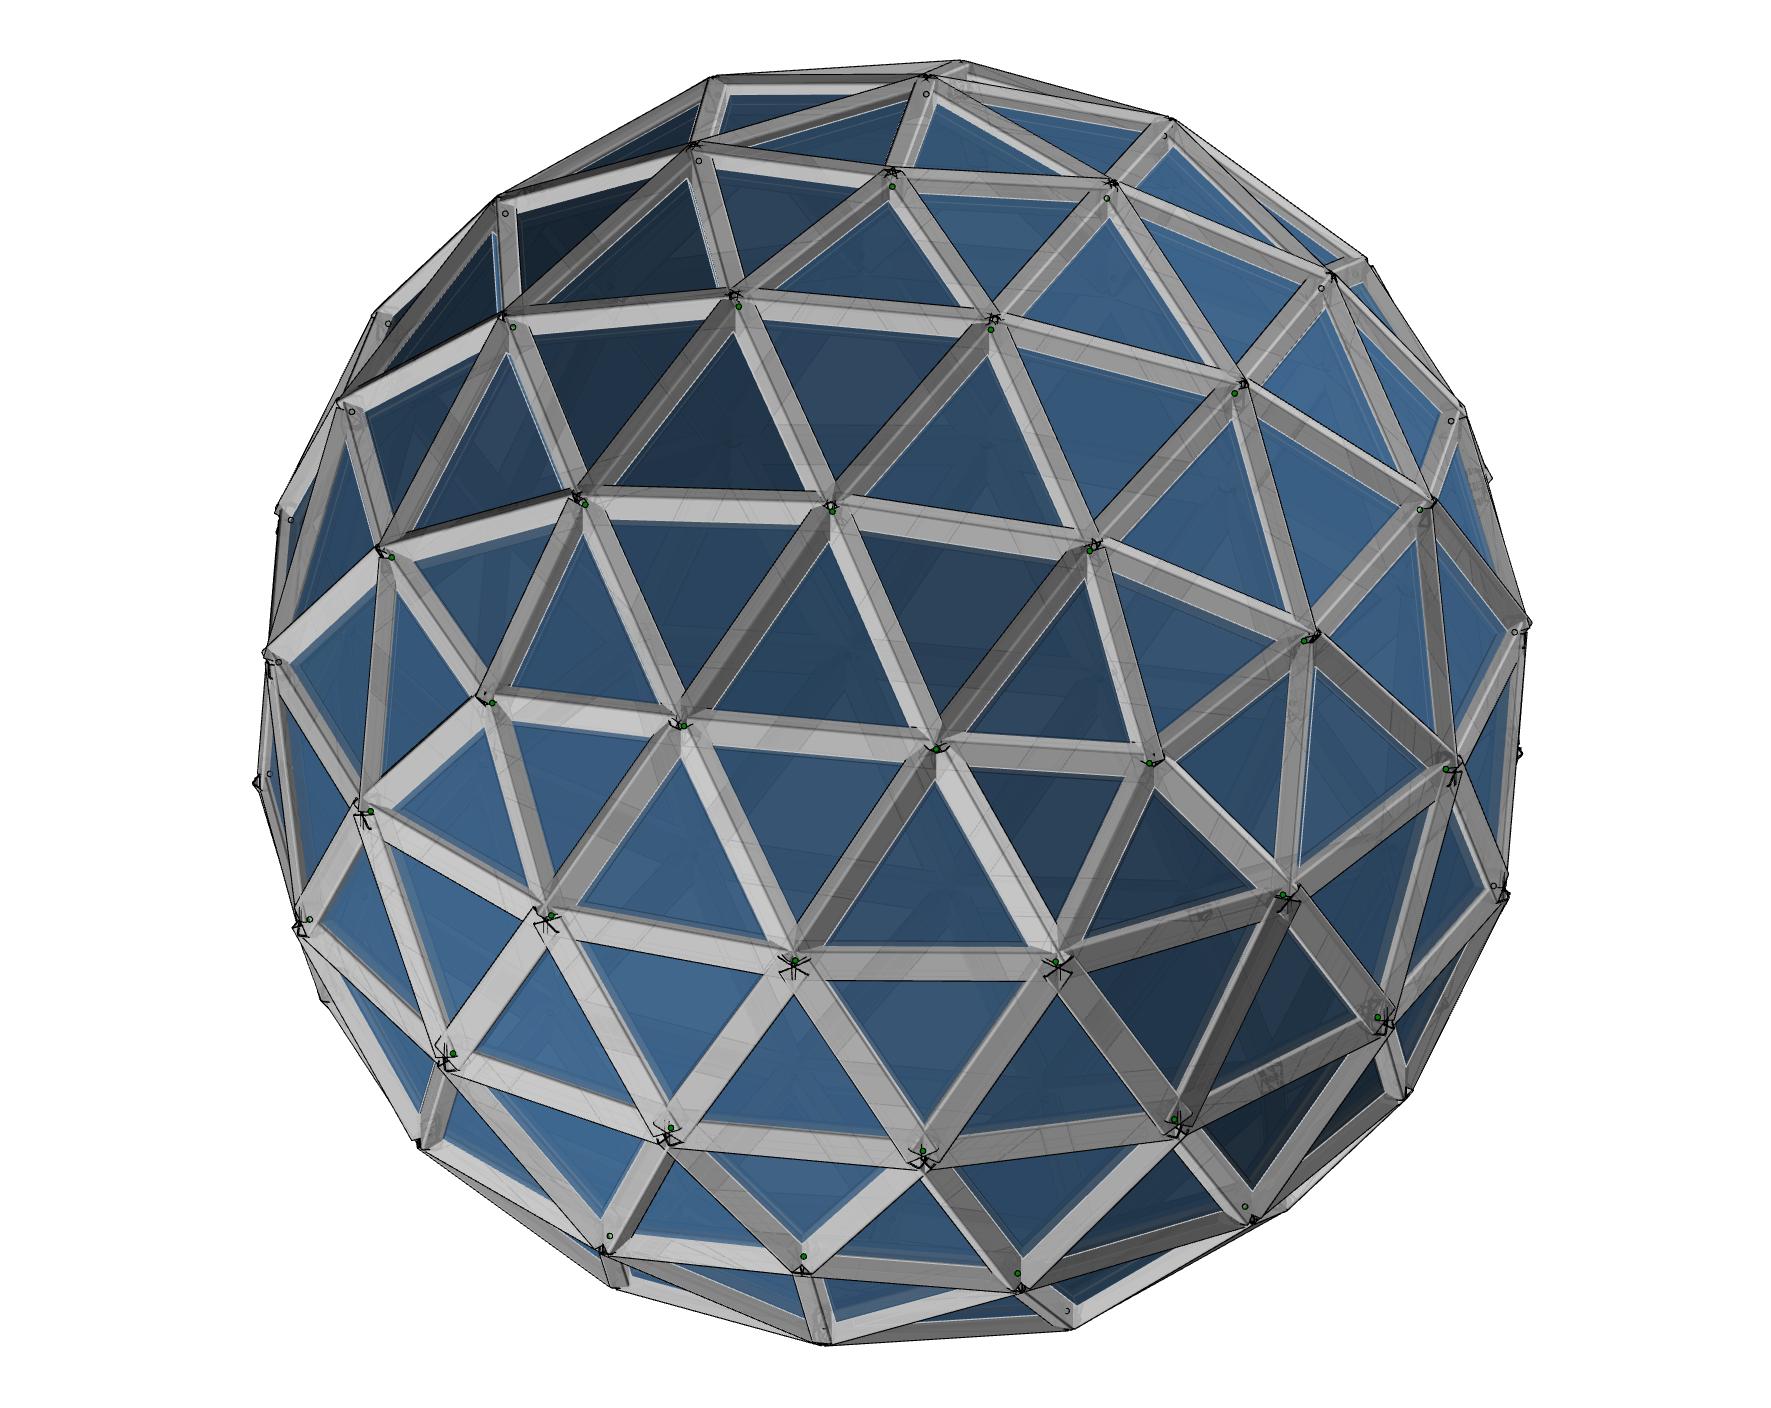 Geodesicdome 3